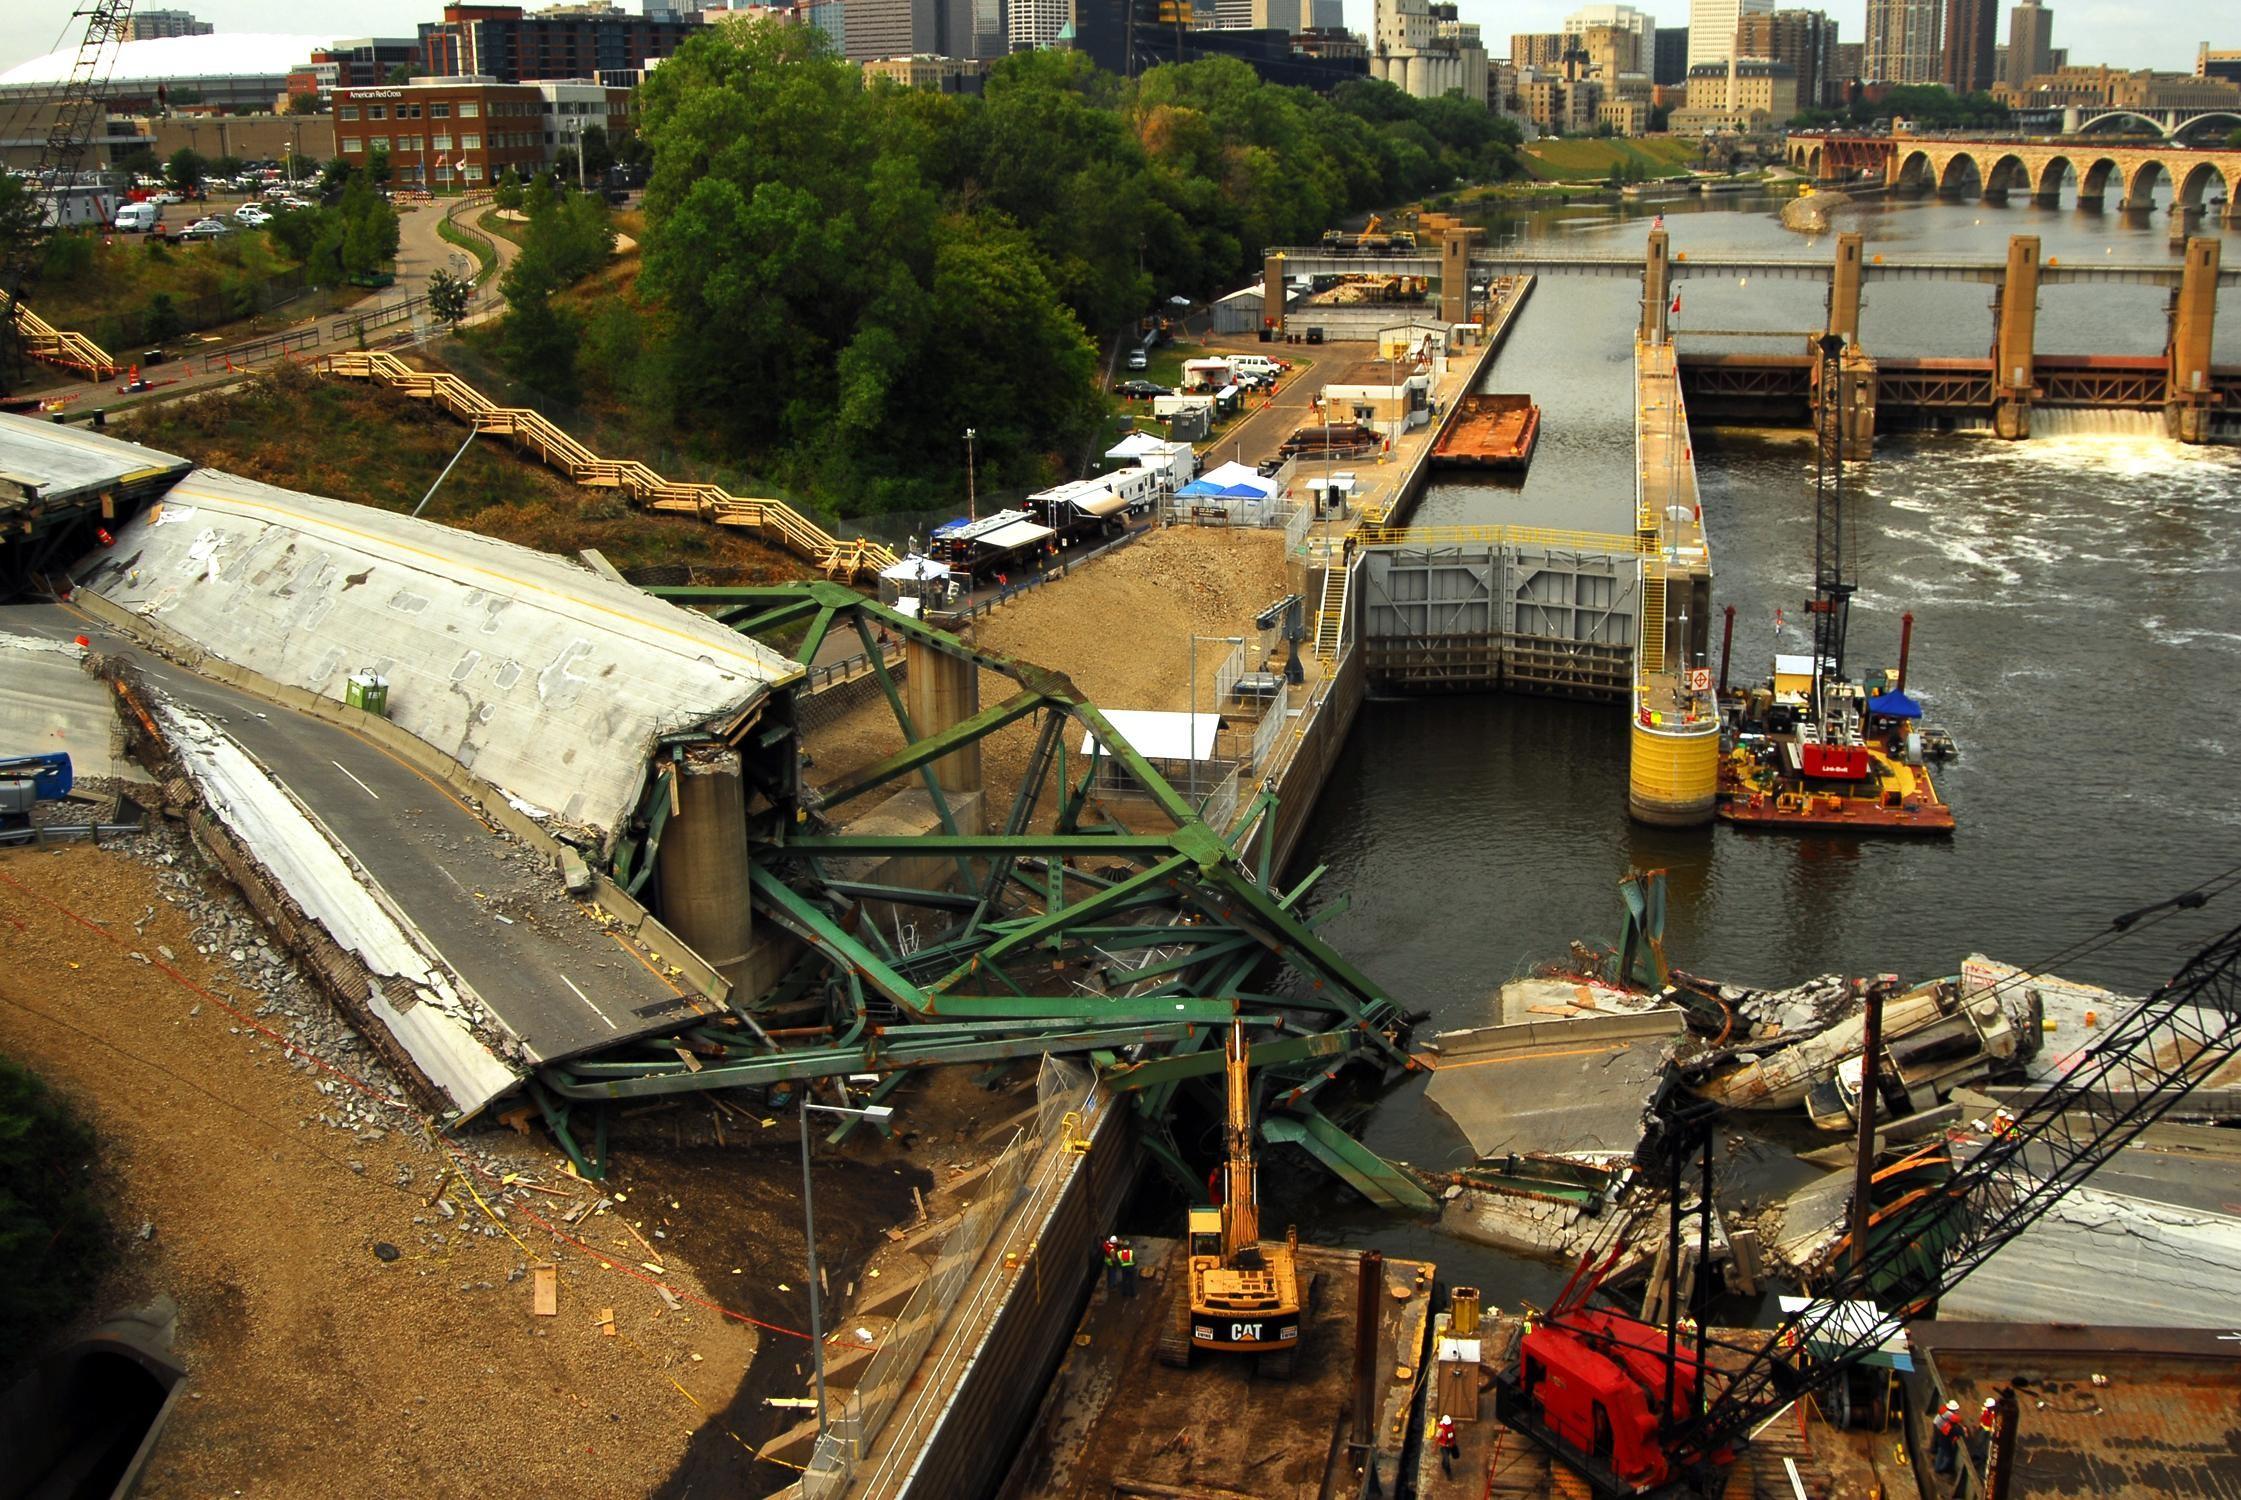 UCT-1 Integrates Engineering Skills to Support Minneapolis